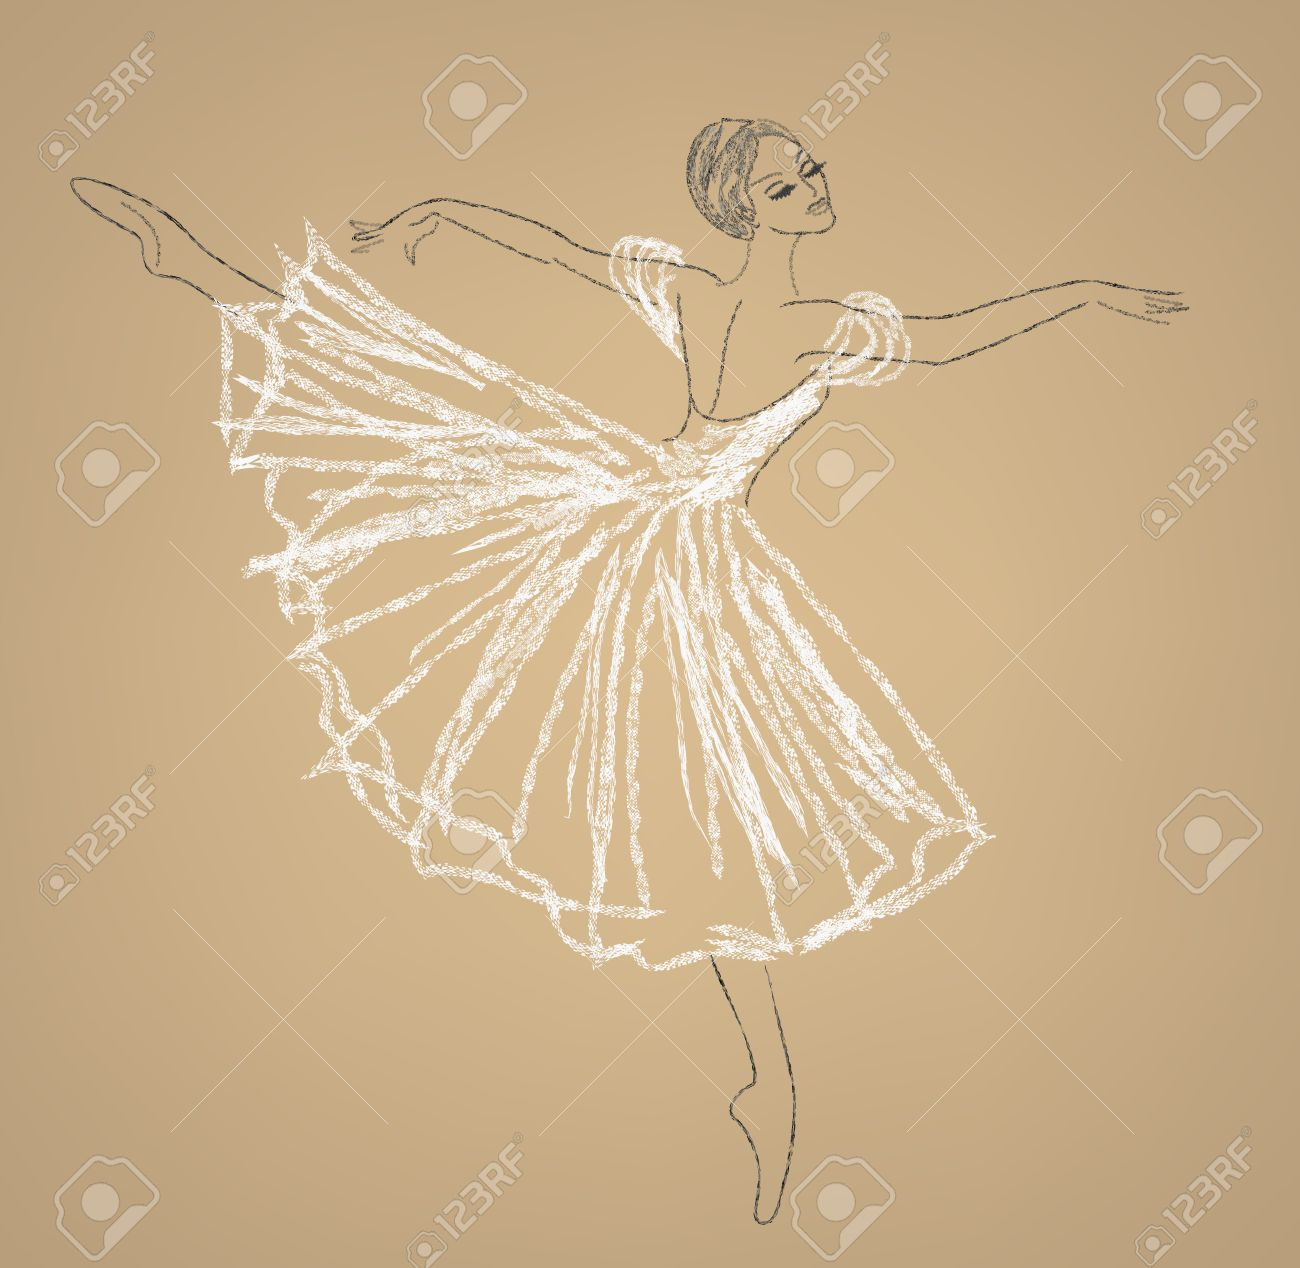 Pencil sketch of dancing ballerina in white dress stock vector 37705662